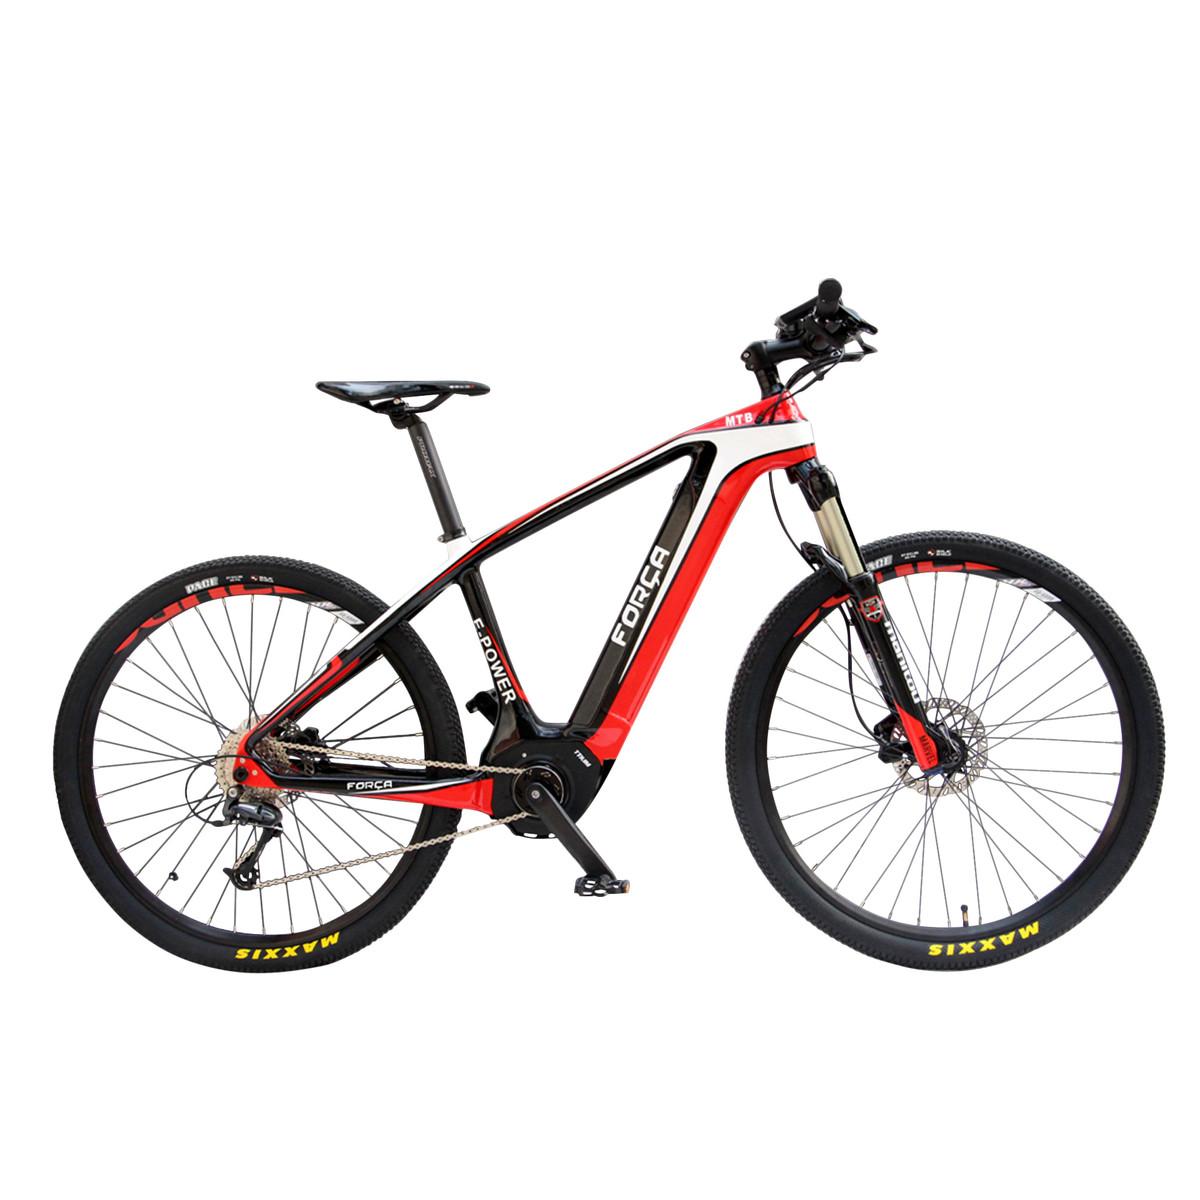 FORÇA E-Bike Karbon 27,5er Hardtail Mountainbike